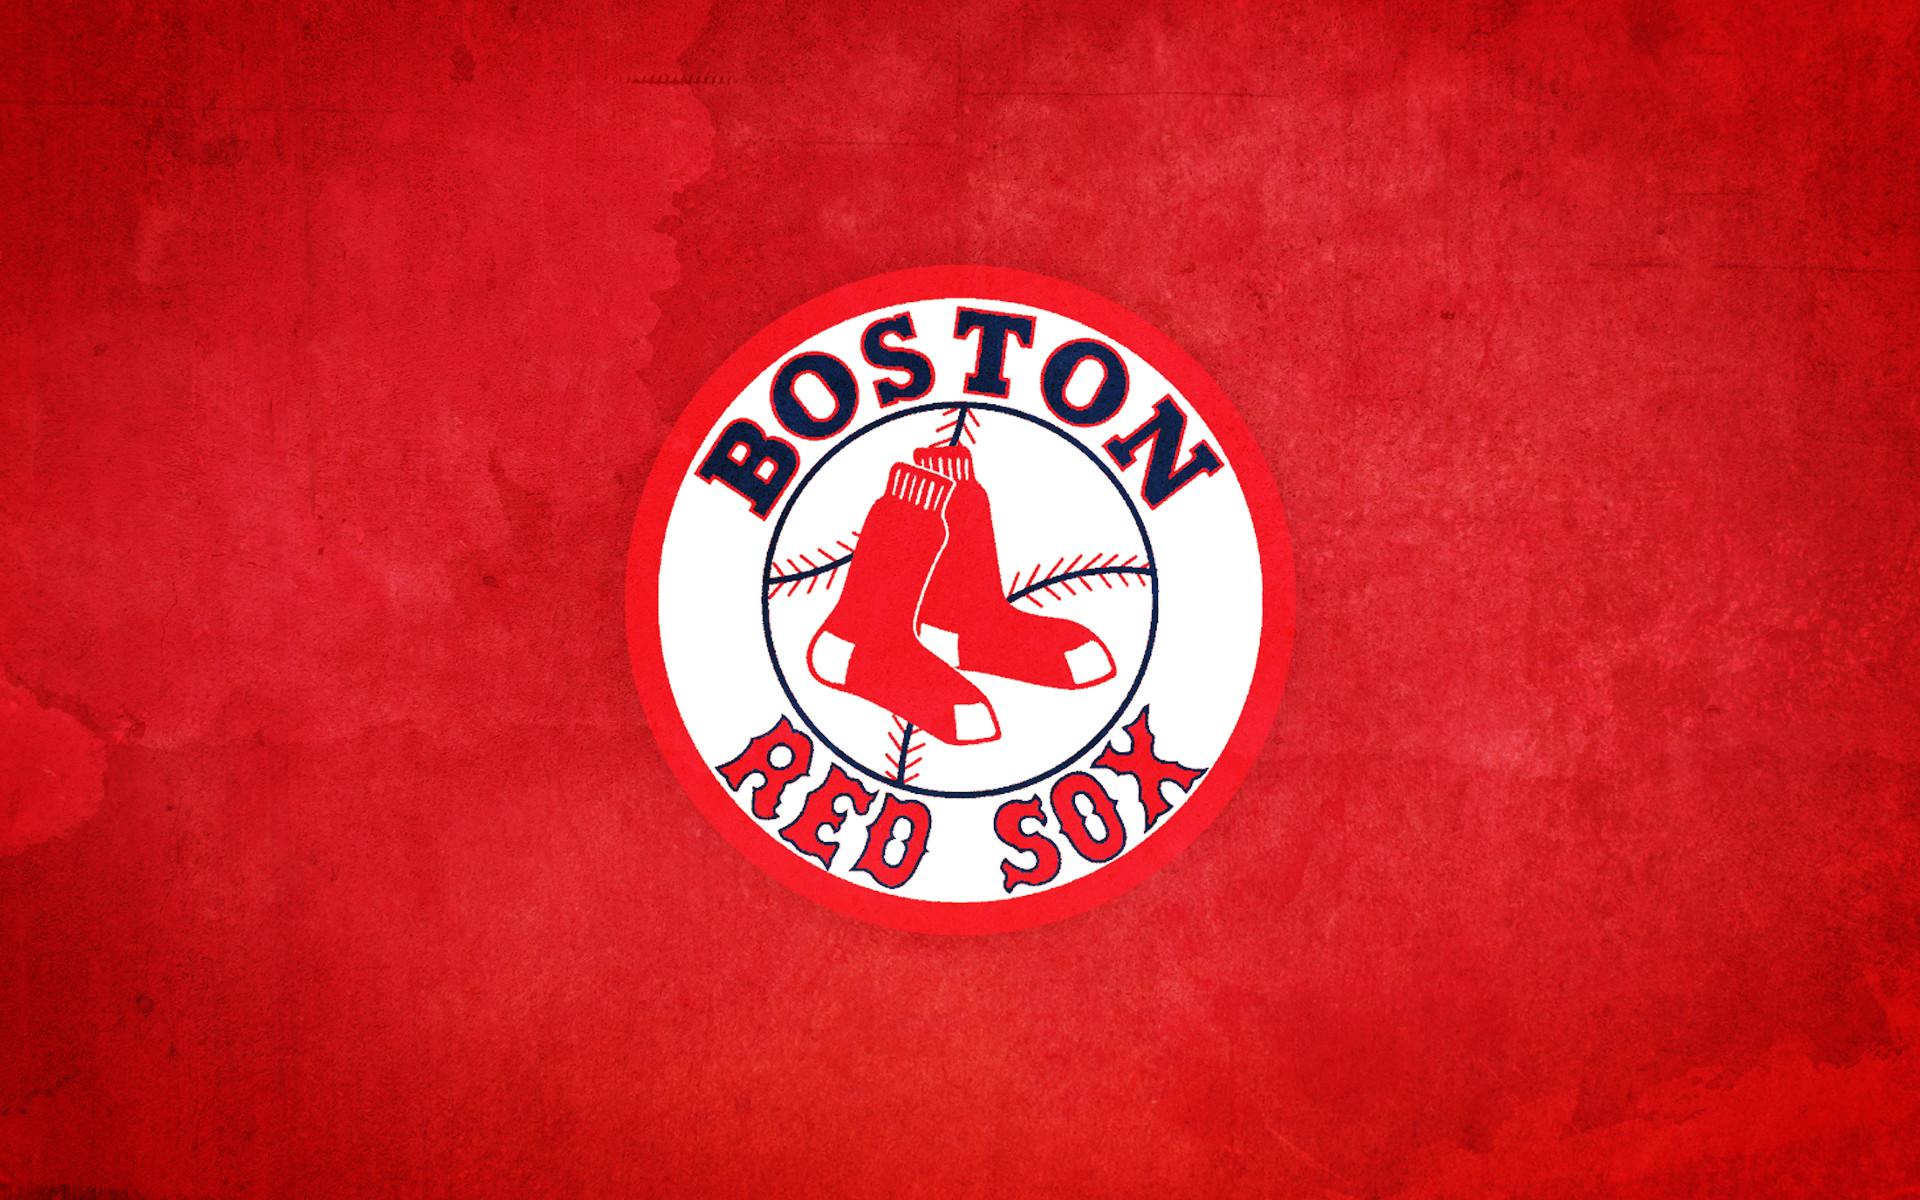 Boston Red Sox Logo Wallpapers – Wallpaper Zone